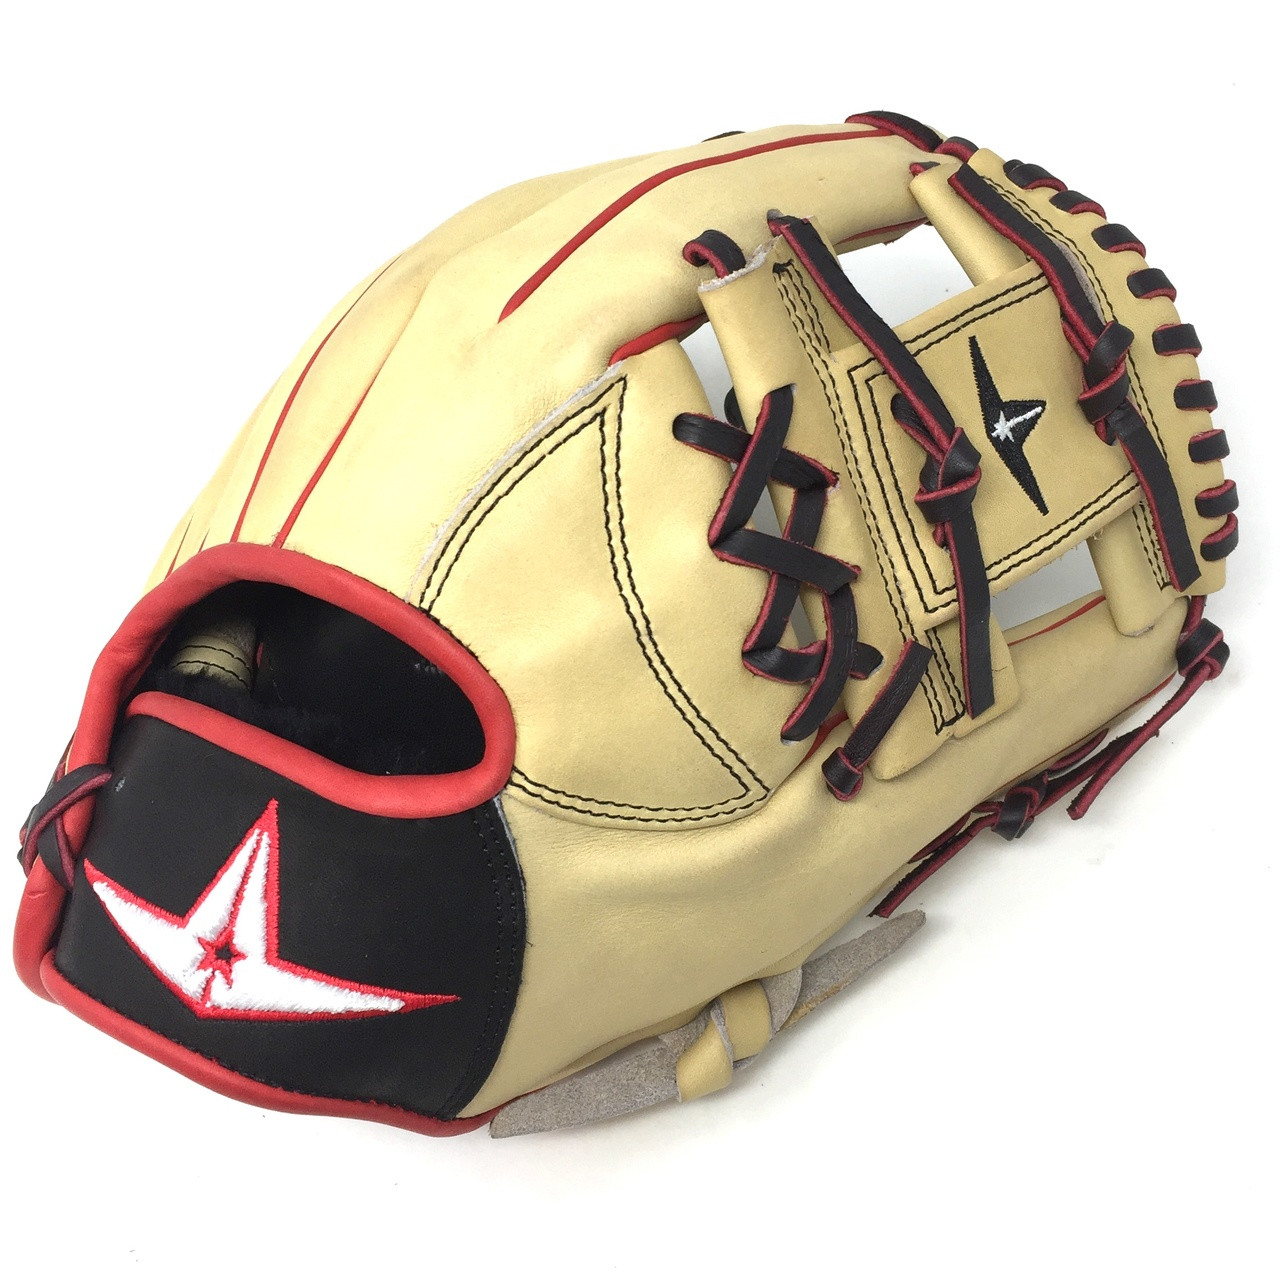 All Star Pro Elite 115 Baseball Glove I Web Right Hand Throw